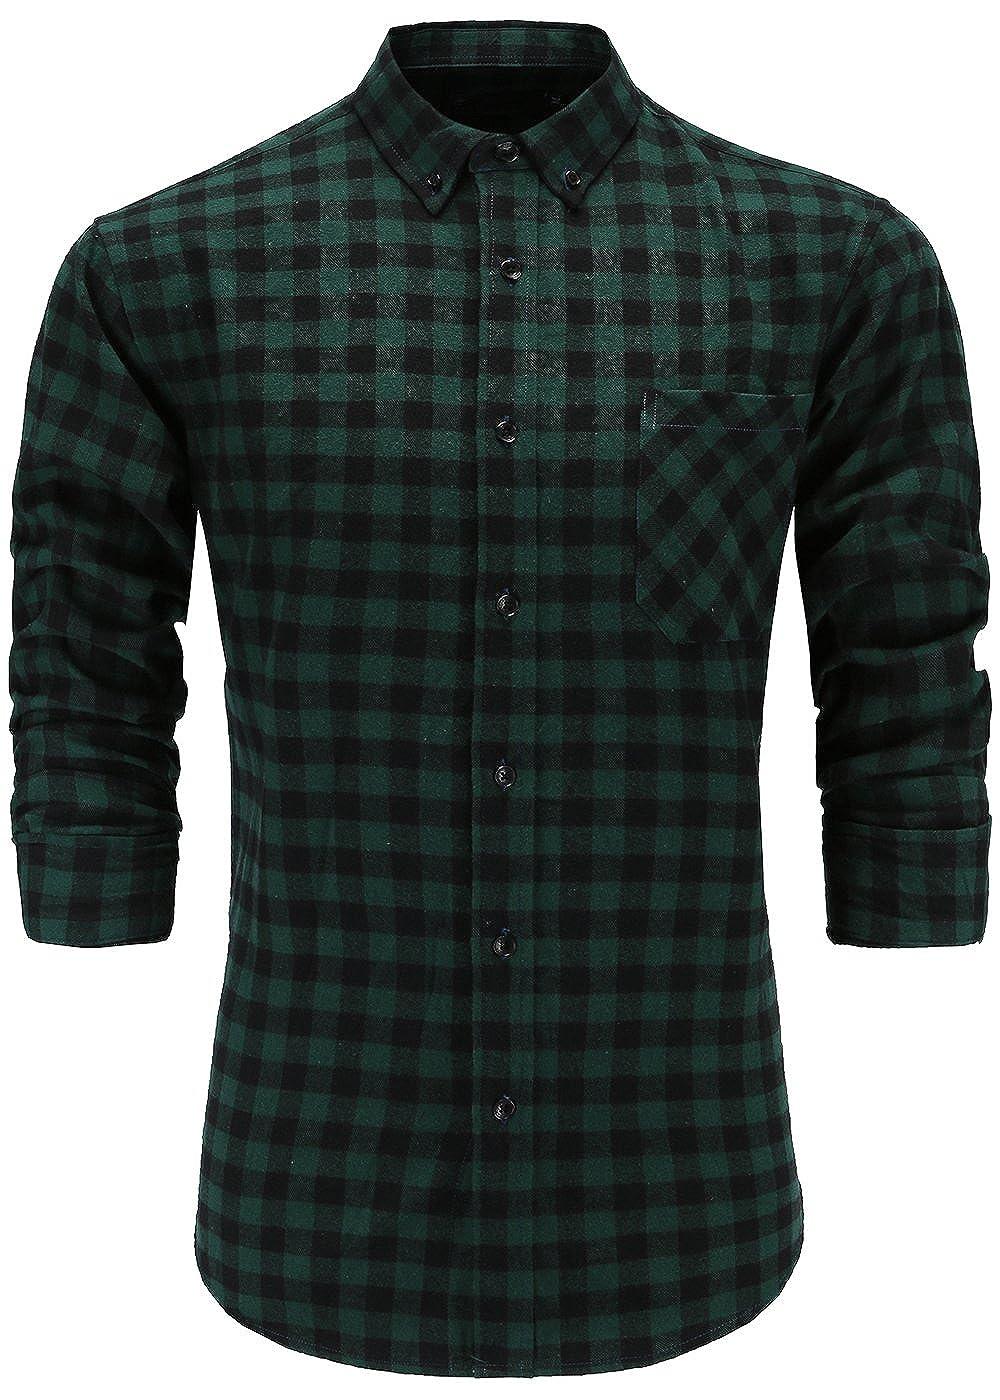 GoldCut Mens 100/% Flannel Cotton Regular Fit Long Sleeve Button Down Plaid Dress Shirts